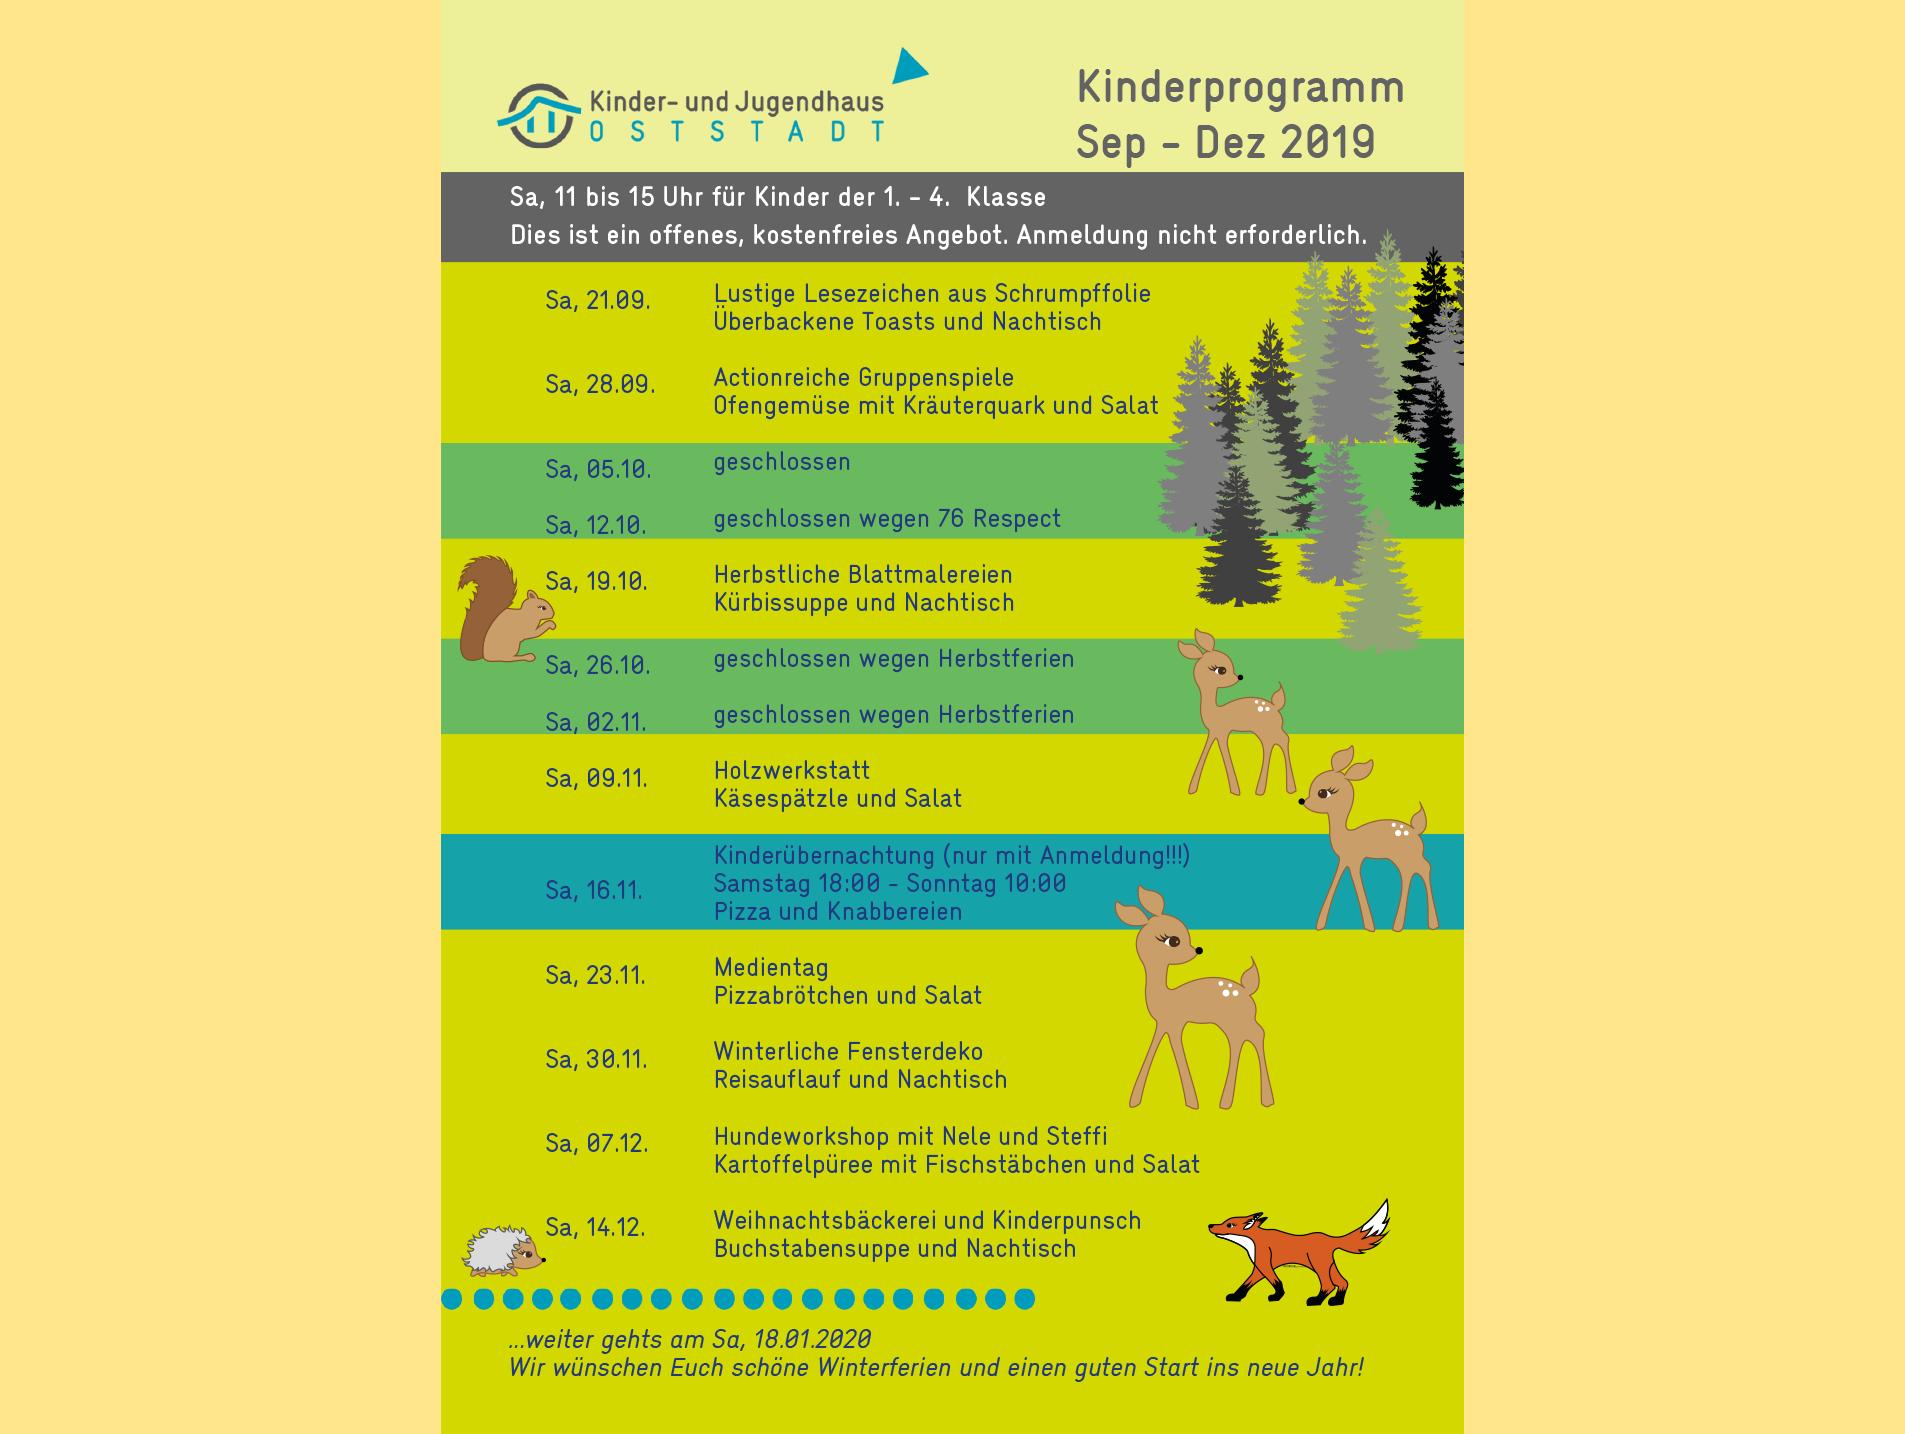 News Kinderprogramm Sep - Dez 2019